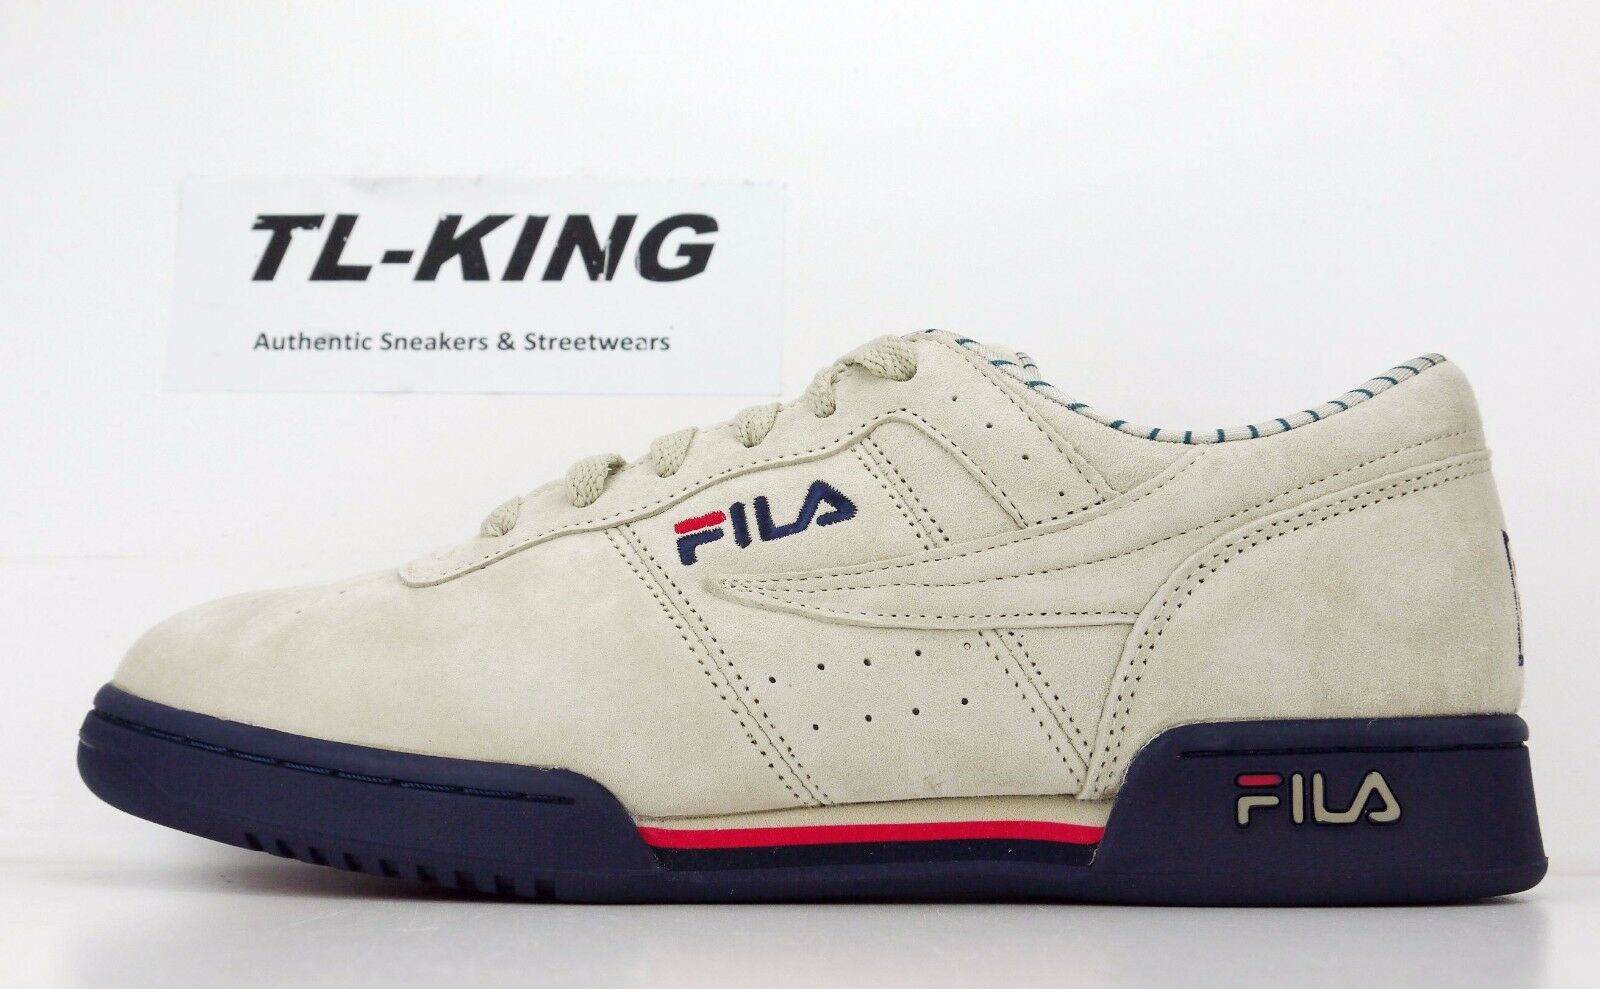 Fila Original Fitness PS Cream Navy Red Beige bluee Pinstrip 1VF80127-922  70 AD